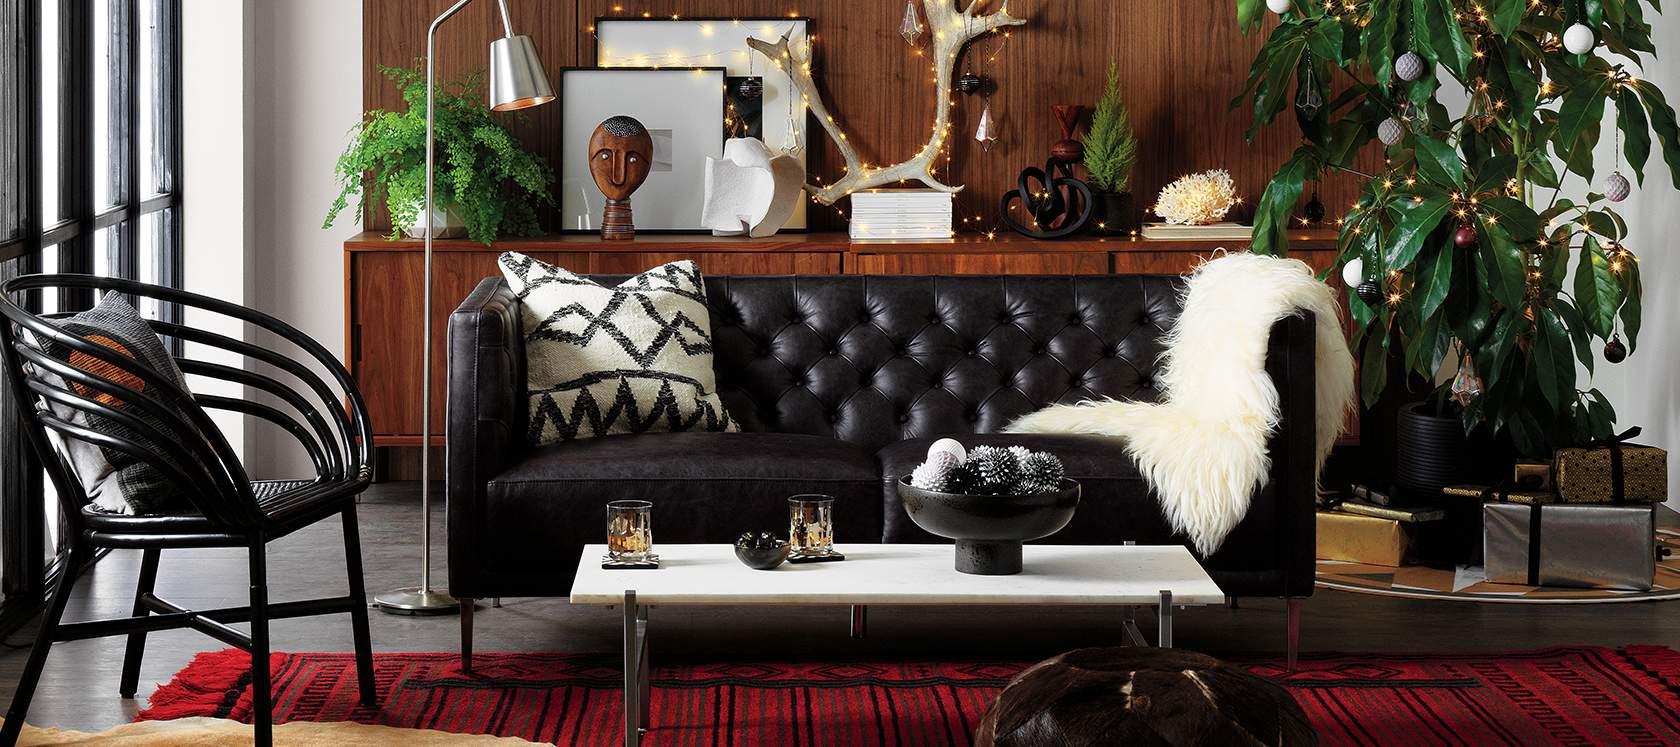 luxe  livable  leather  shop all furniture. Modern and Unique Furniture Design   CB2